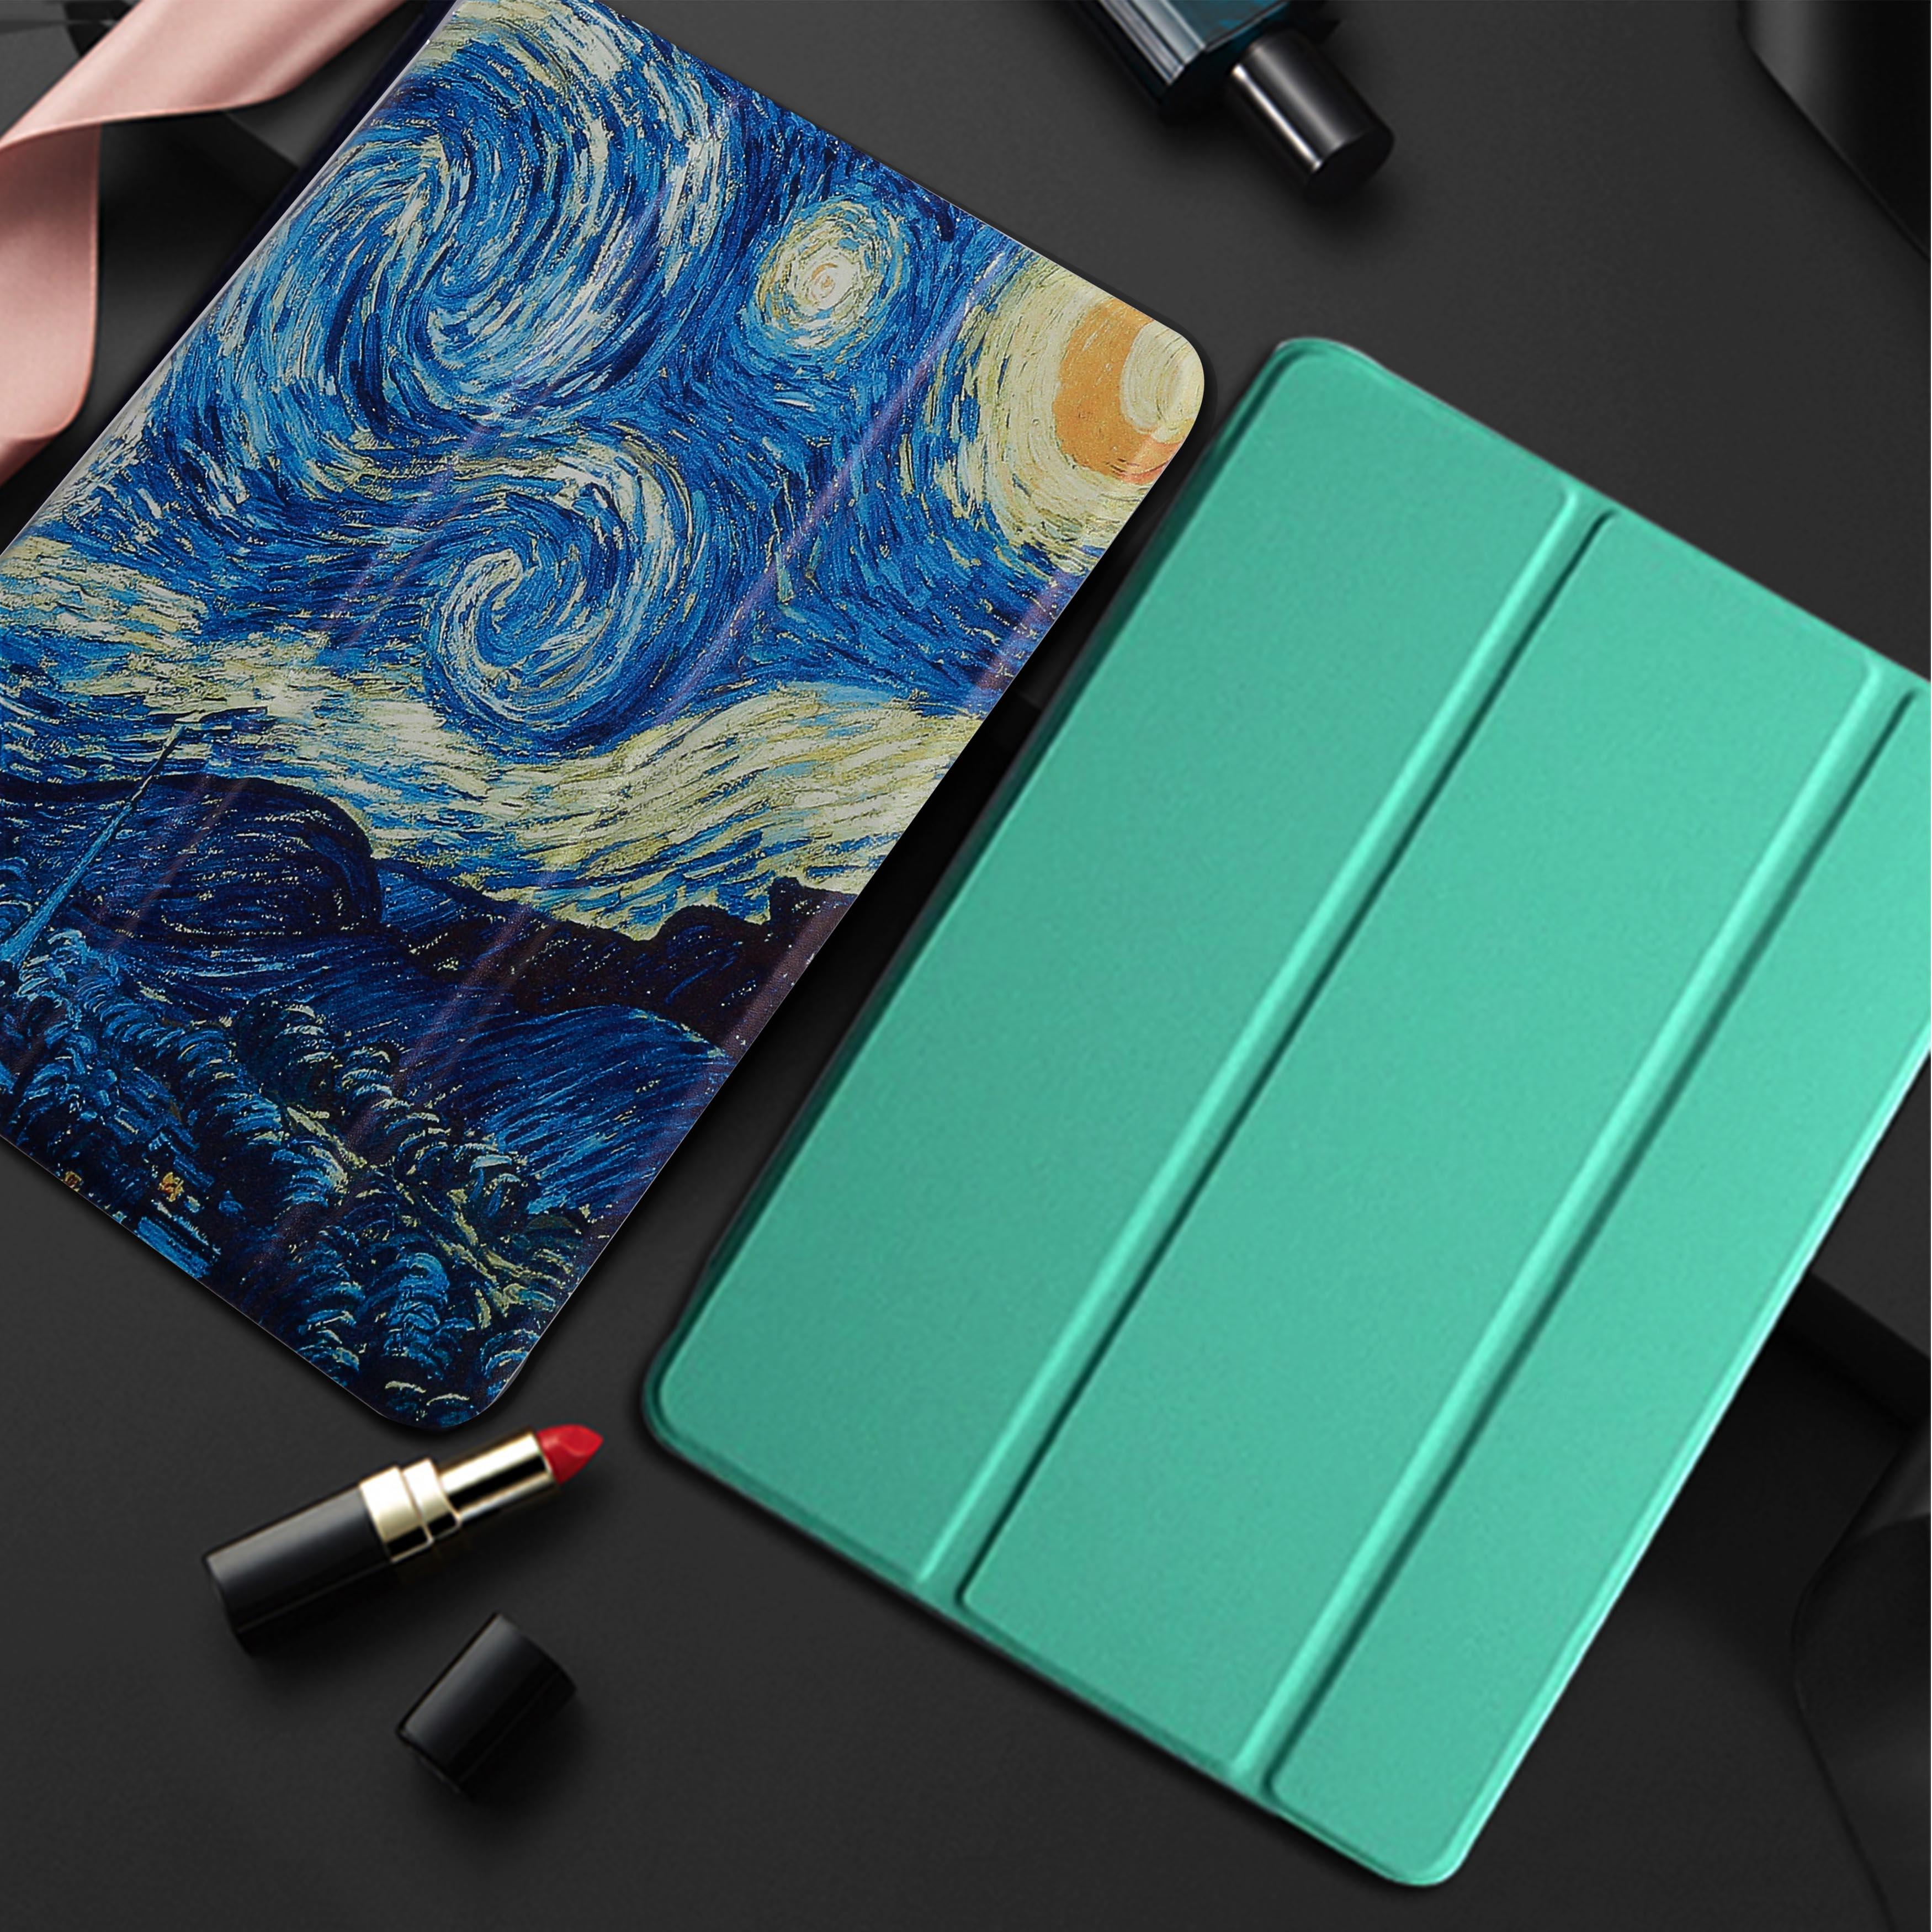 Tablet Case For Apple New IPad Mini 4 Mini 5 2019 7.9 Inch Fundas PU Ultra Slim Wake Smart Cover Case For IPad Mini 4 5 Case